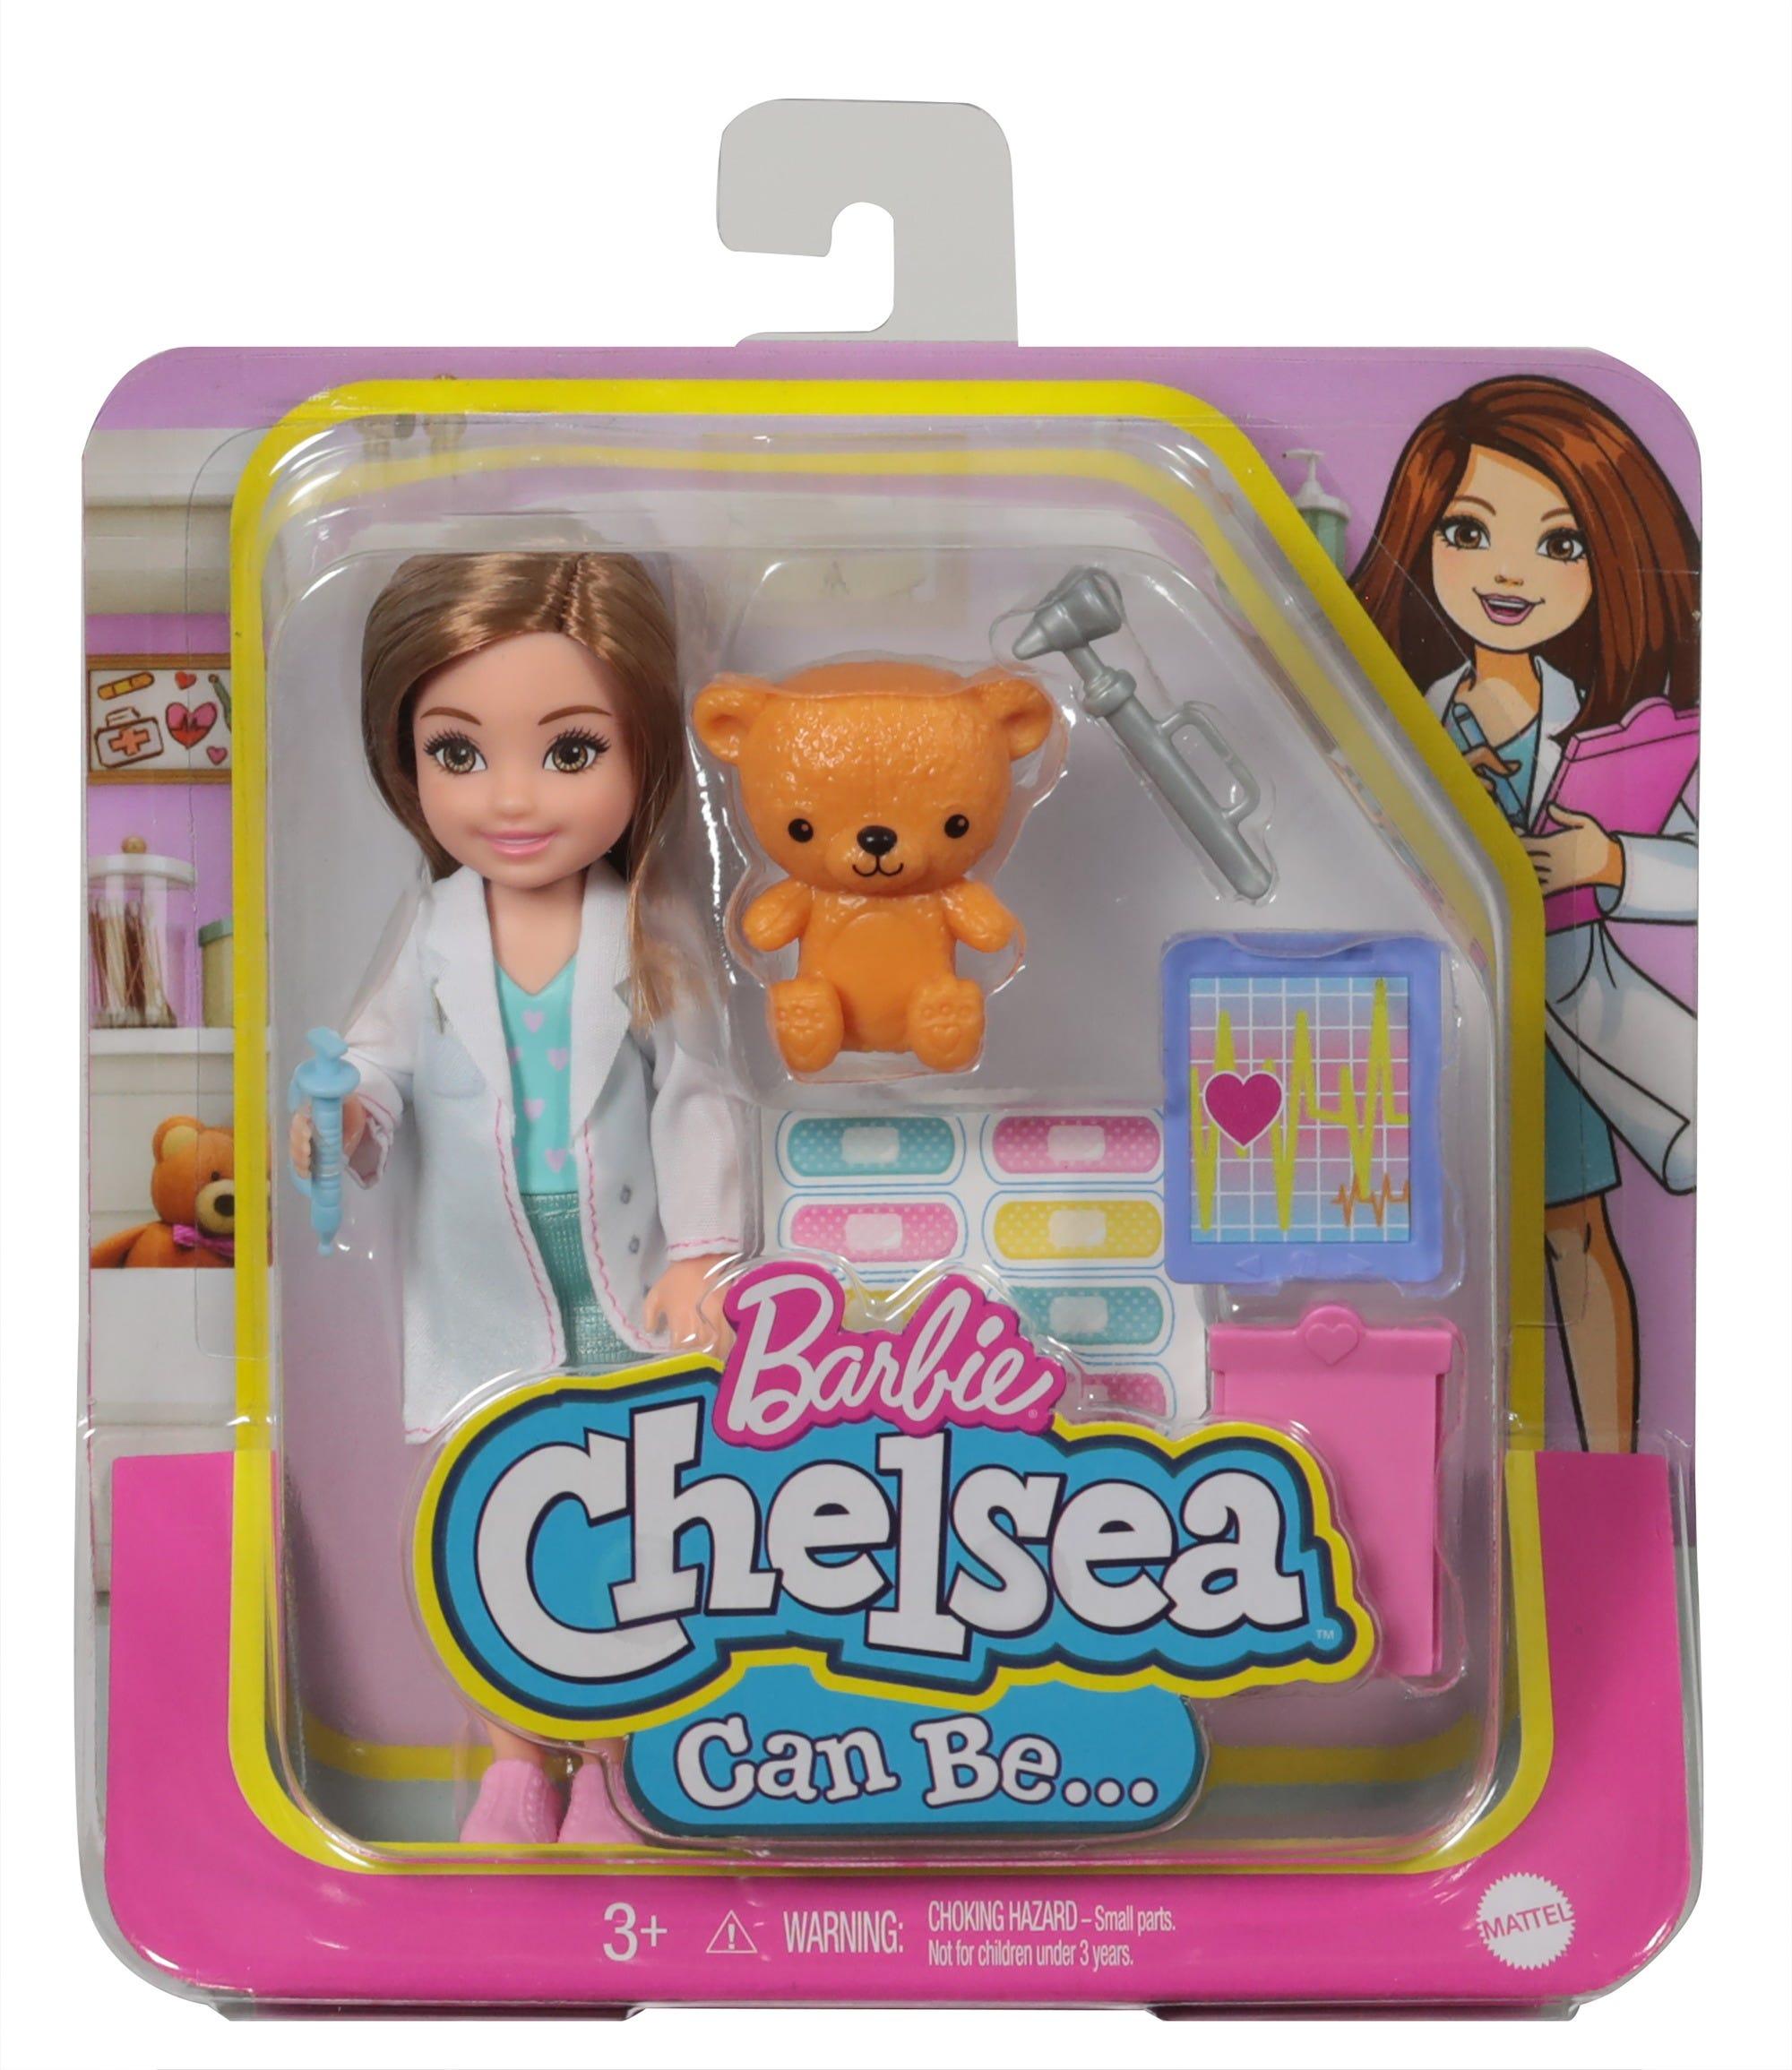 Barbie Chelsea Core Careers Asstortment